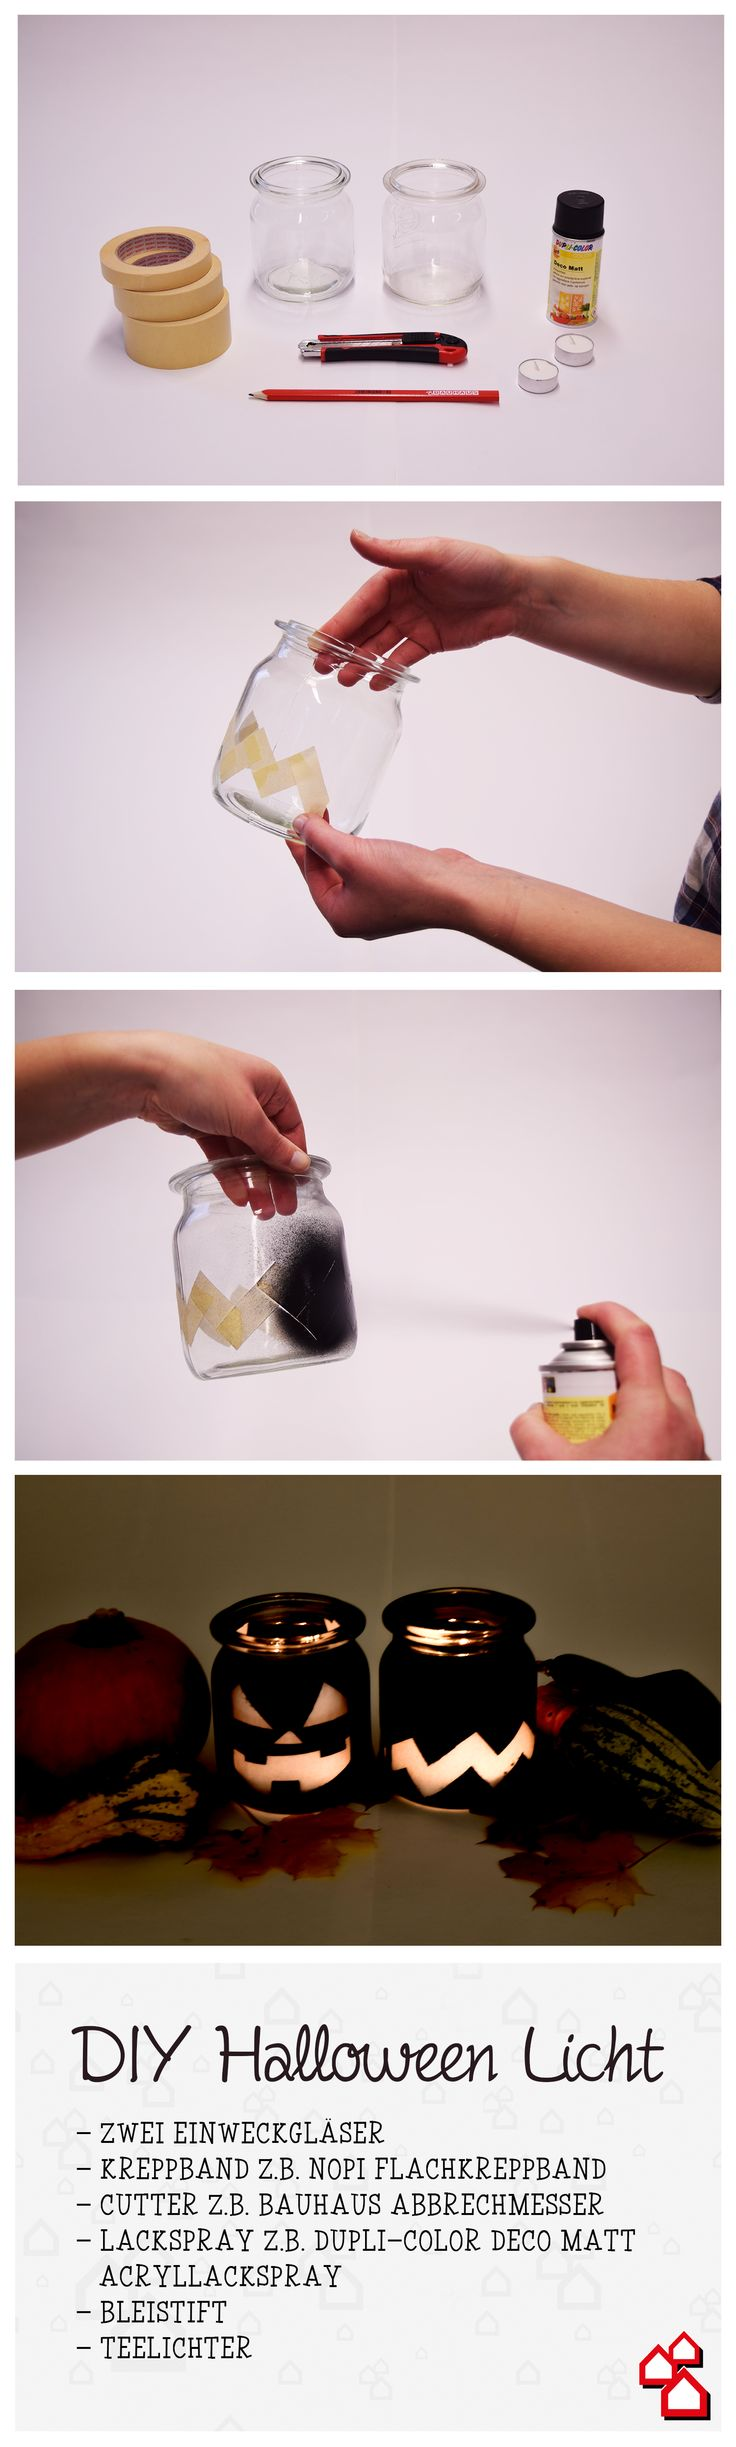 52 best images about diy do it yourself on pinterest. Black Bedroom Furniture Sets. Home Design Ideas